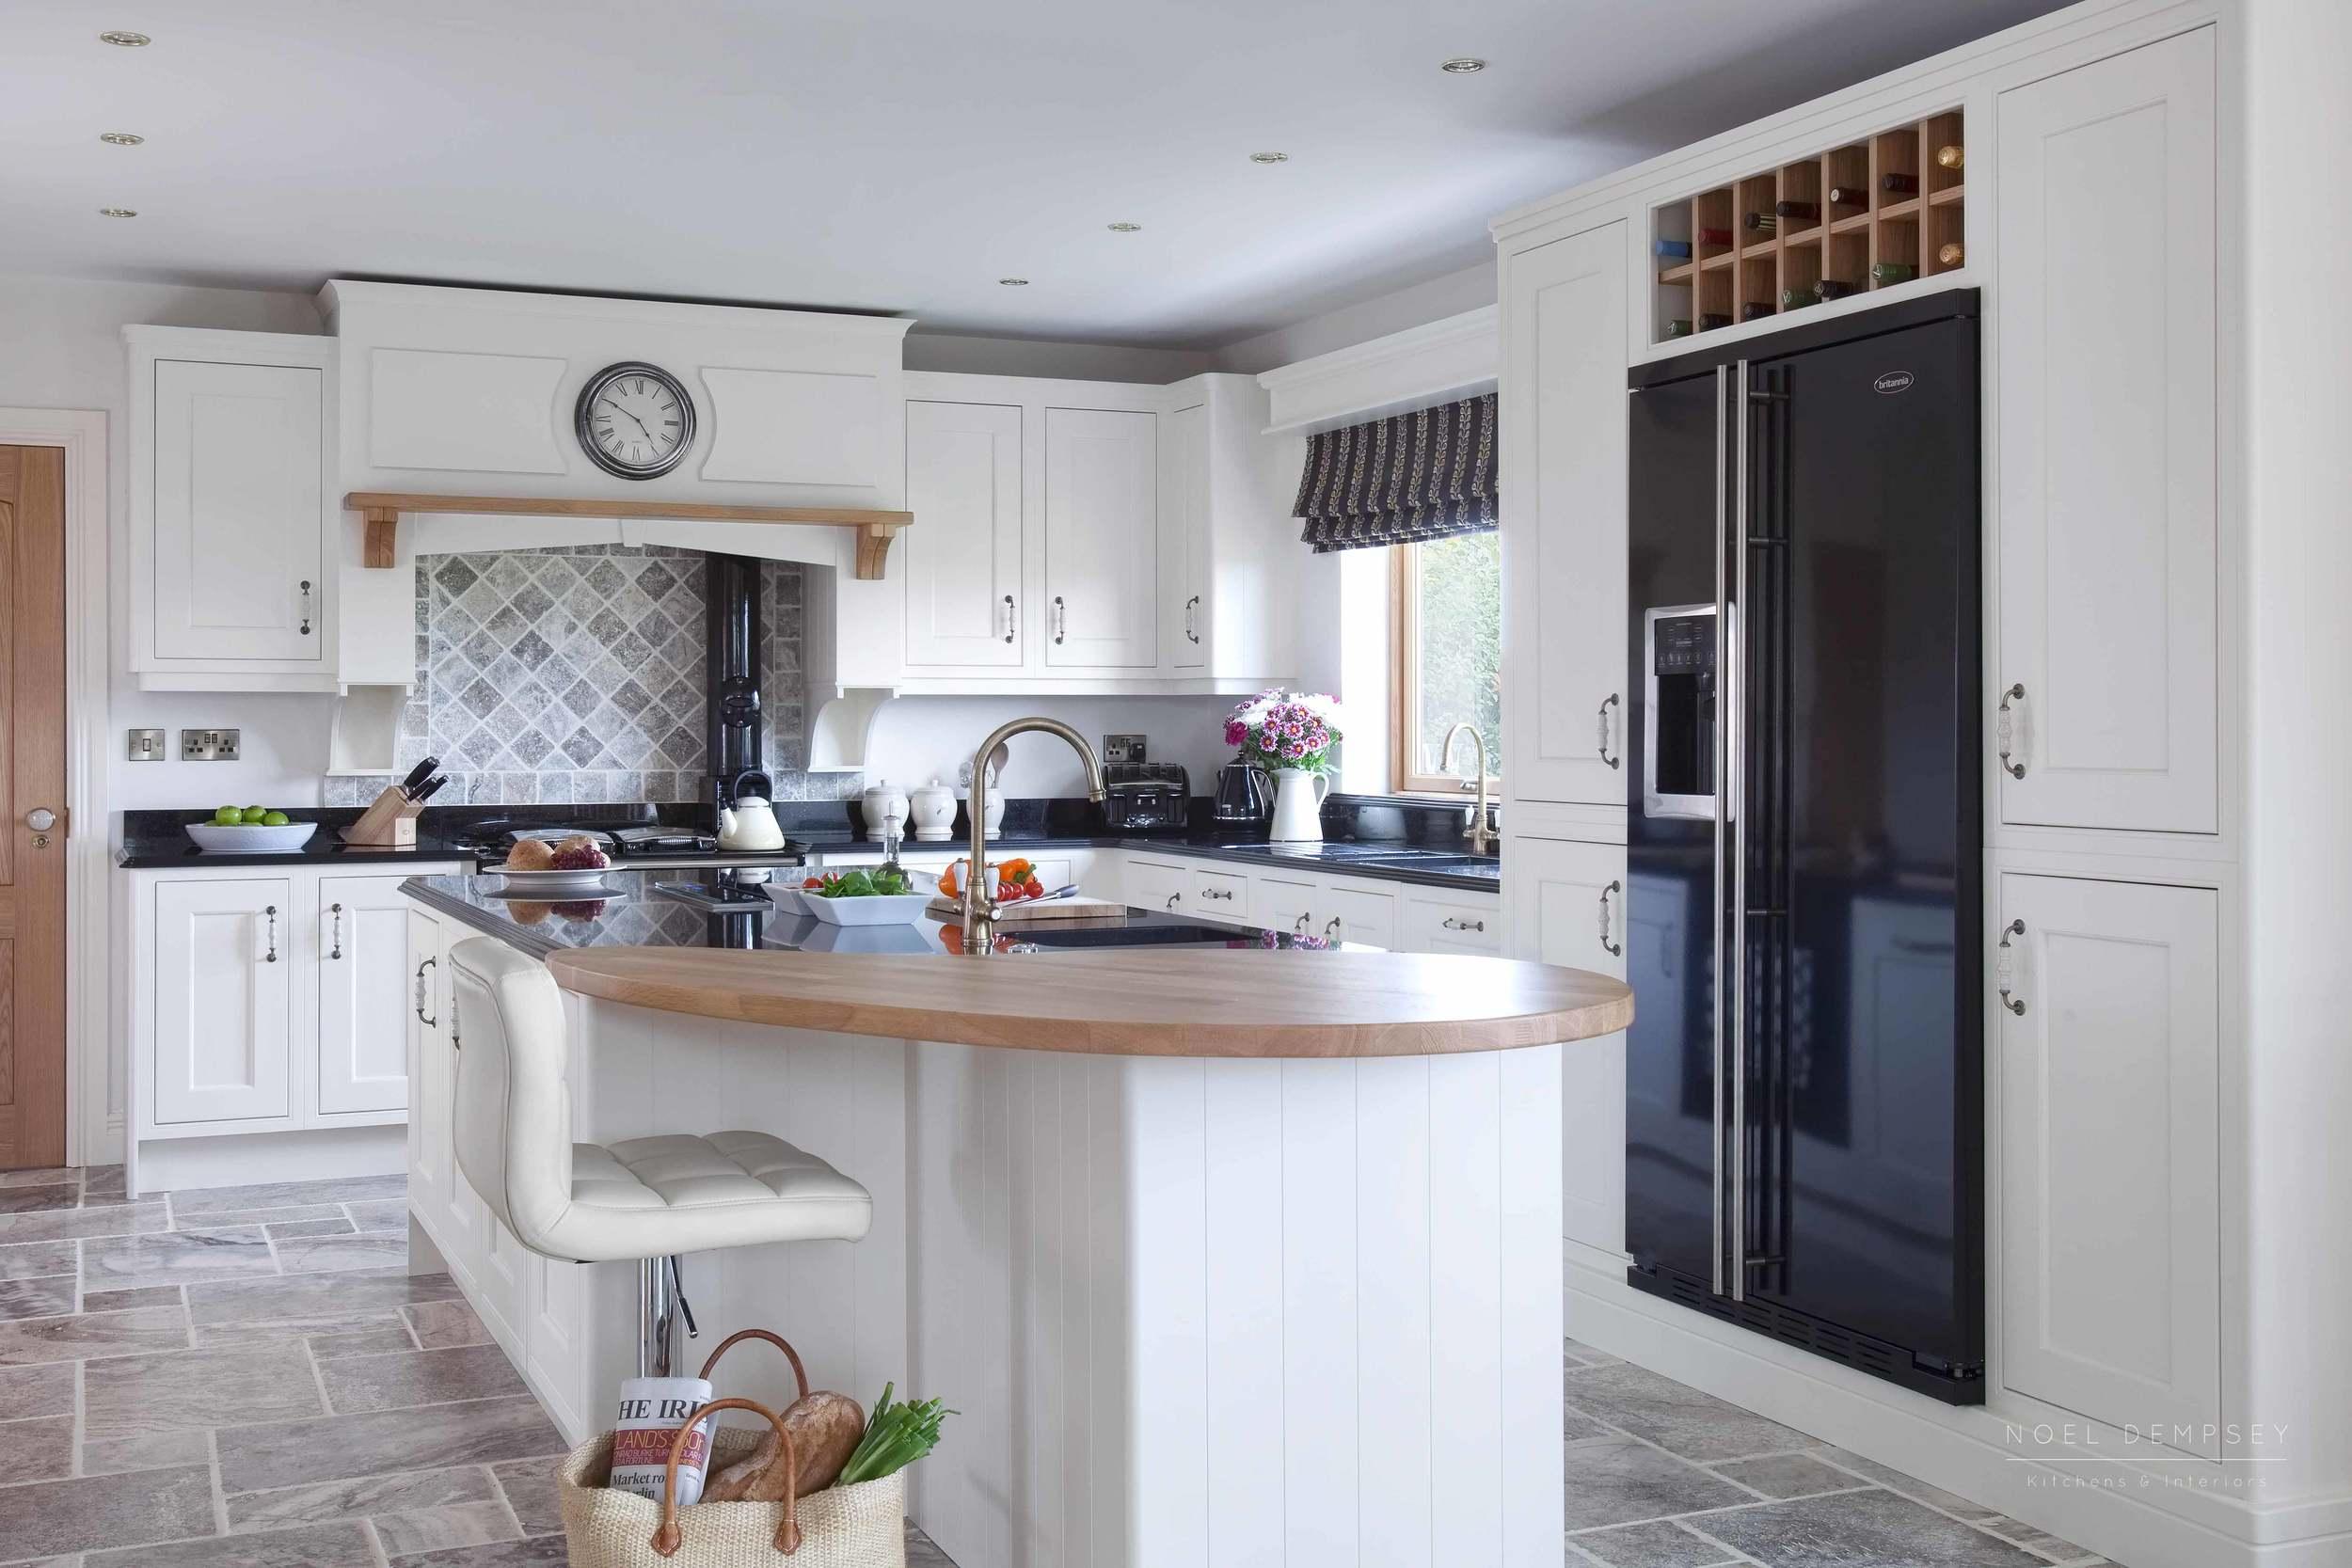 Fox-lane-inframe-hand-painted-kitchens-1.jpg